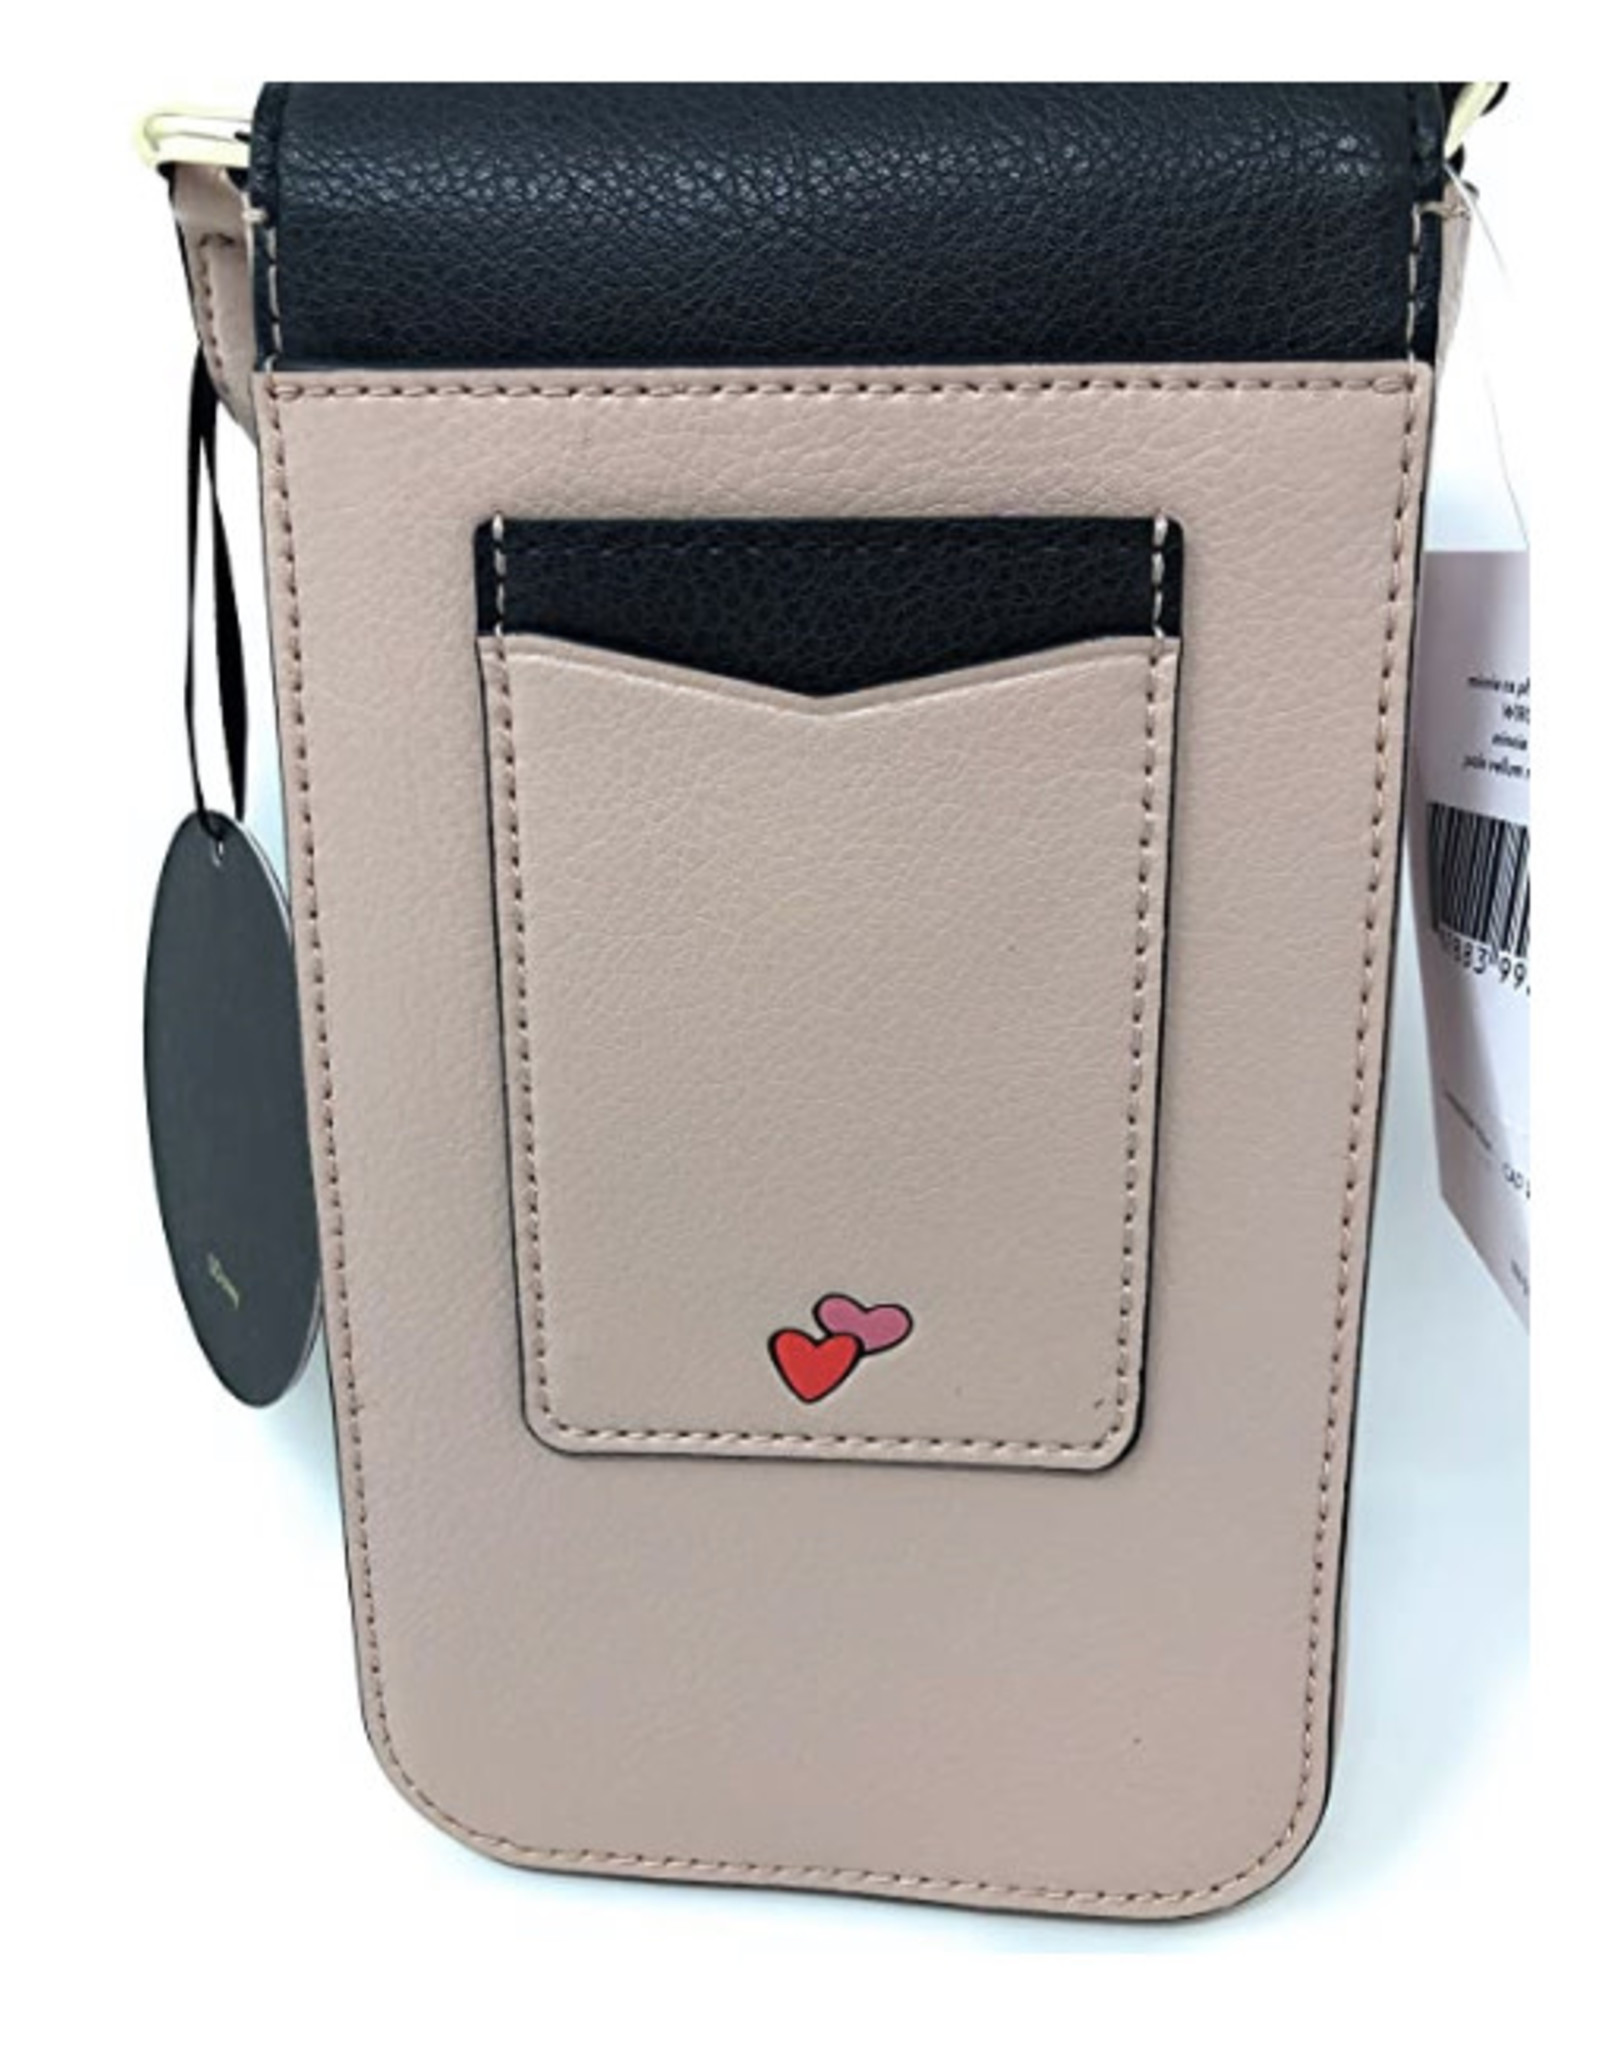 Kate Spade Kate Spade Minnie Mouse NS Flap Phone Crossbody